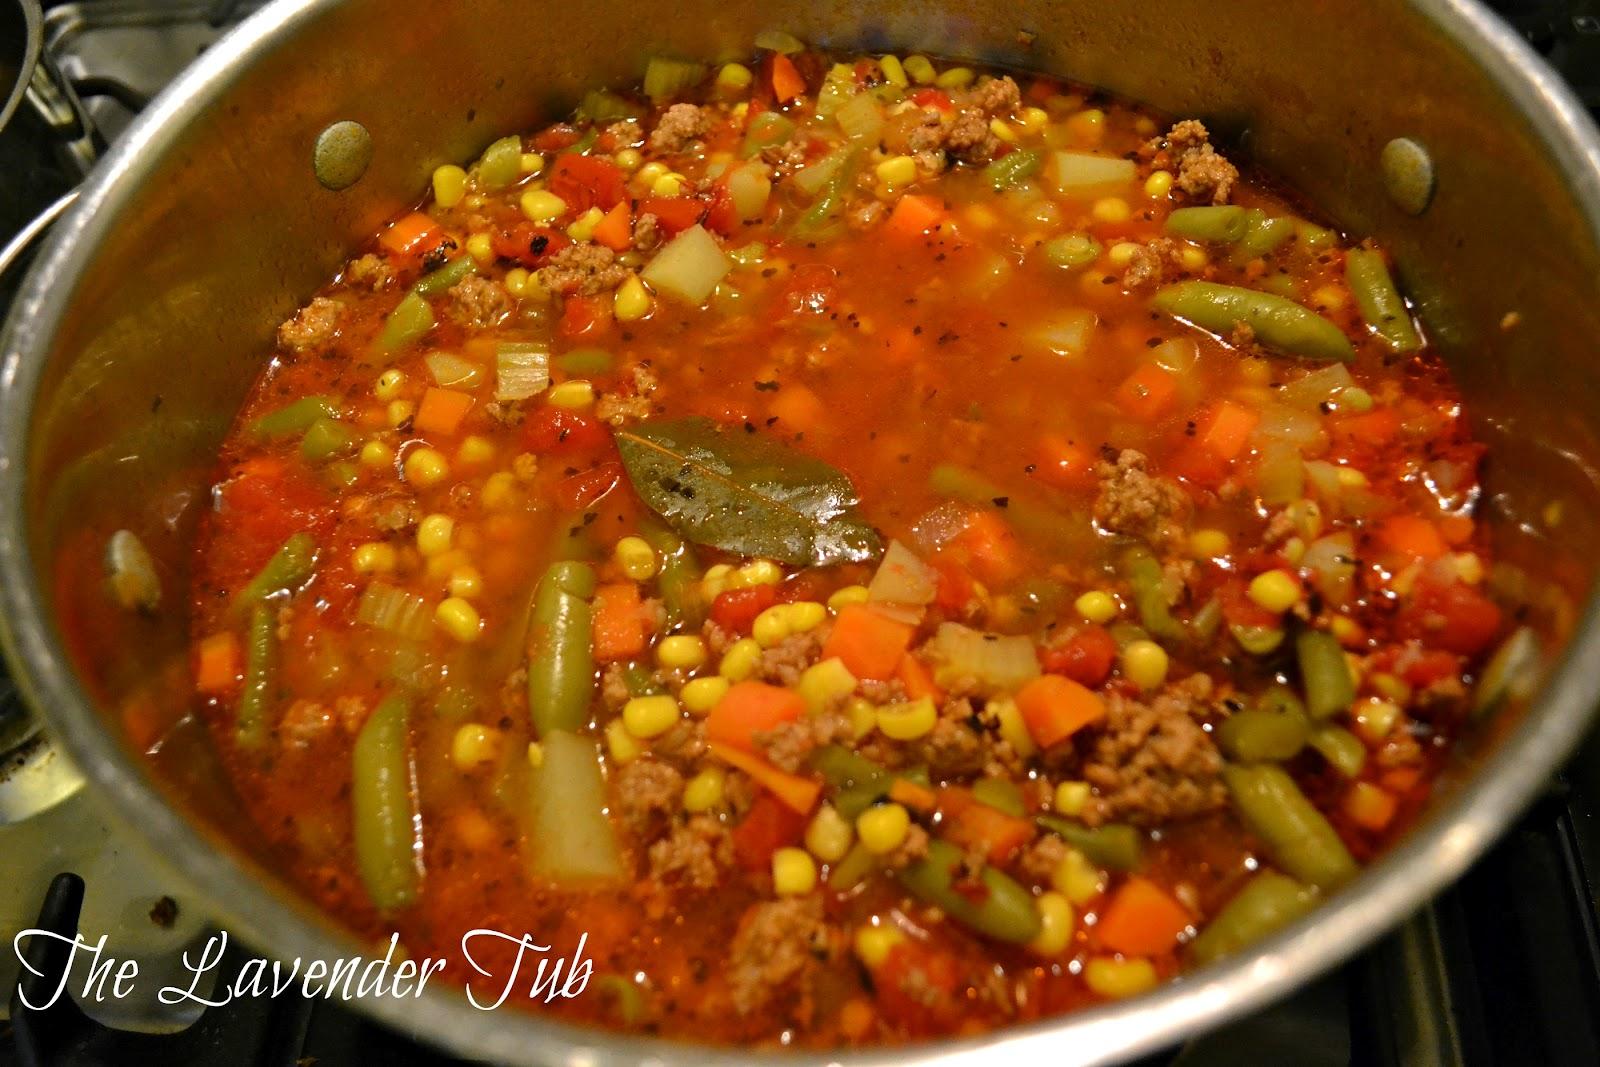 The Lavender Tub: Hamburger-Vegetable Soup